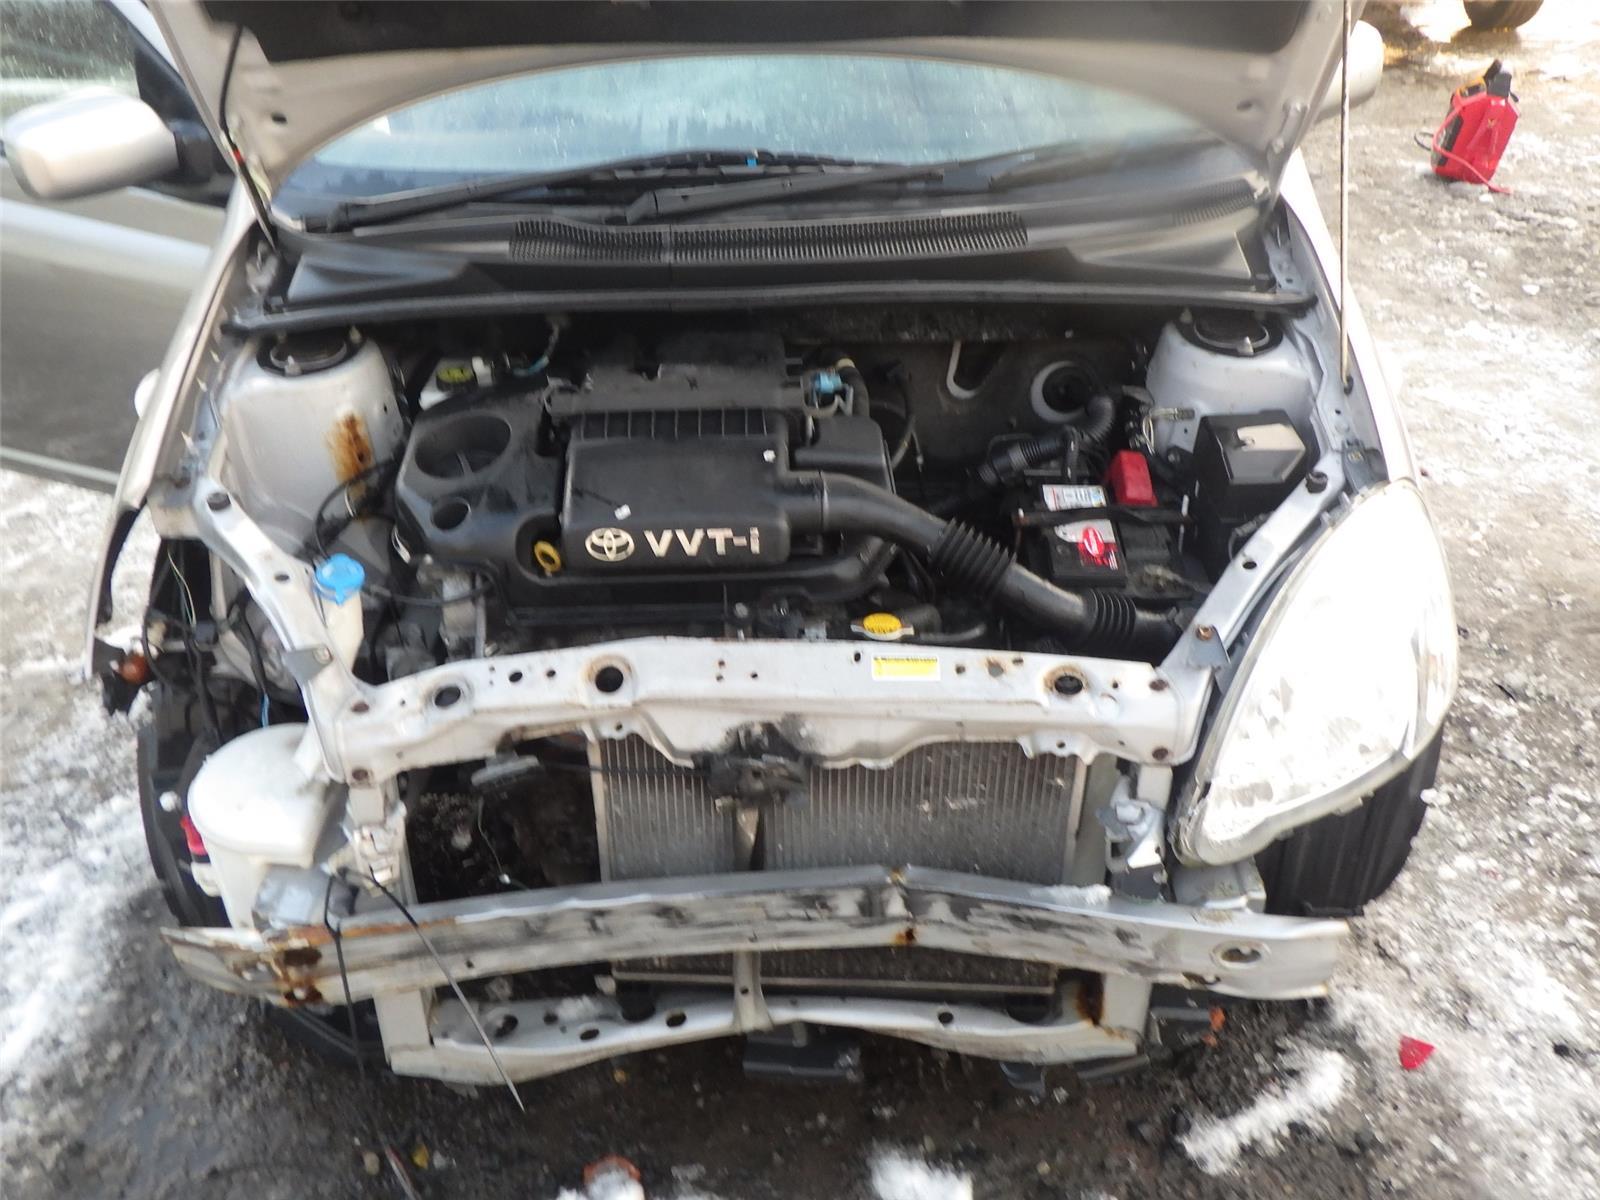 Toyota Vvt I V6 Engine Diagram Explained Wiring Diagrams I5 Parts 2 5 Example Electrical U2022 Celica